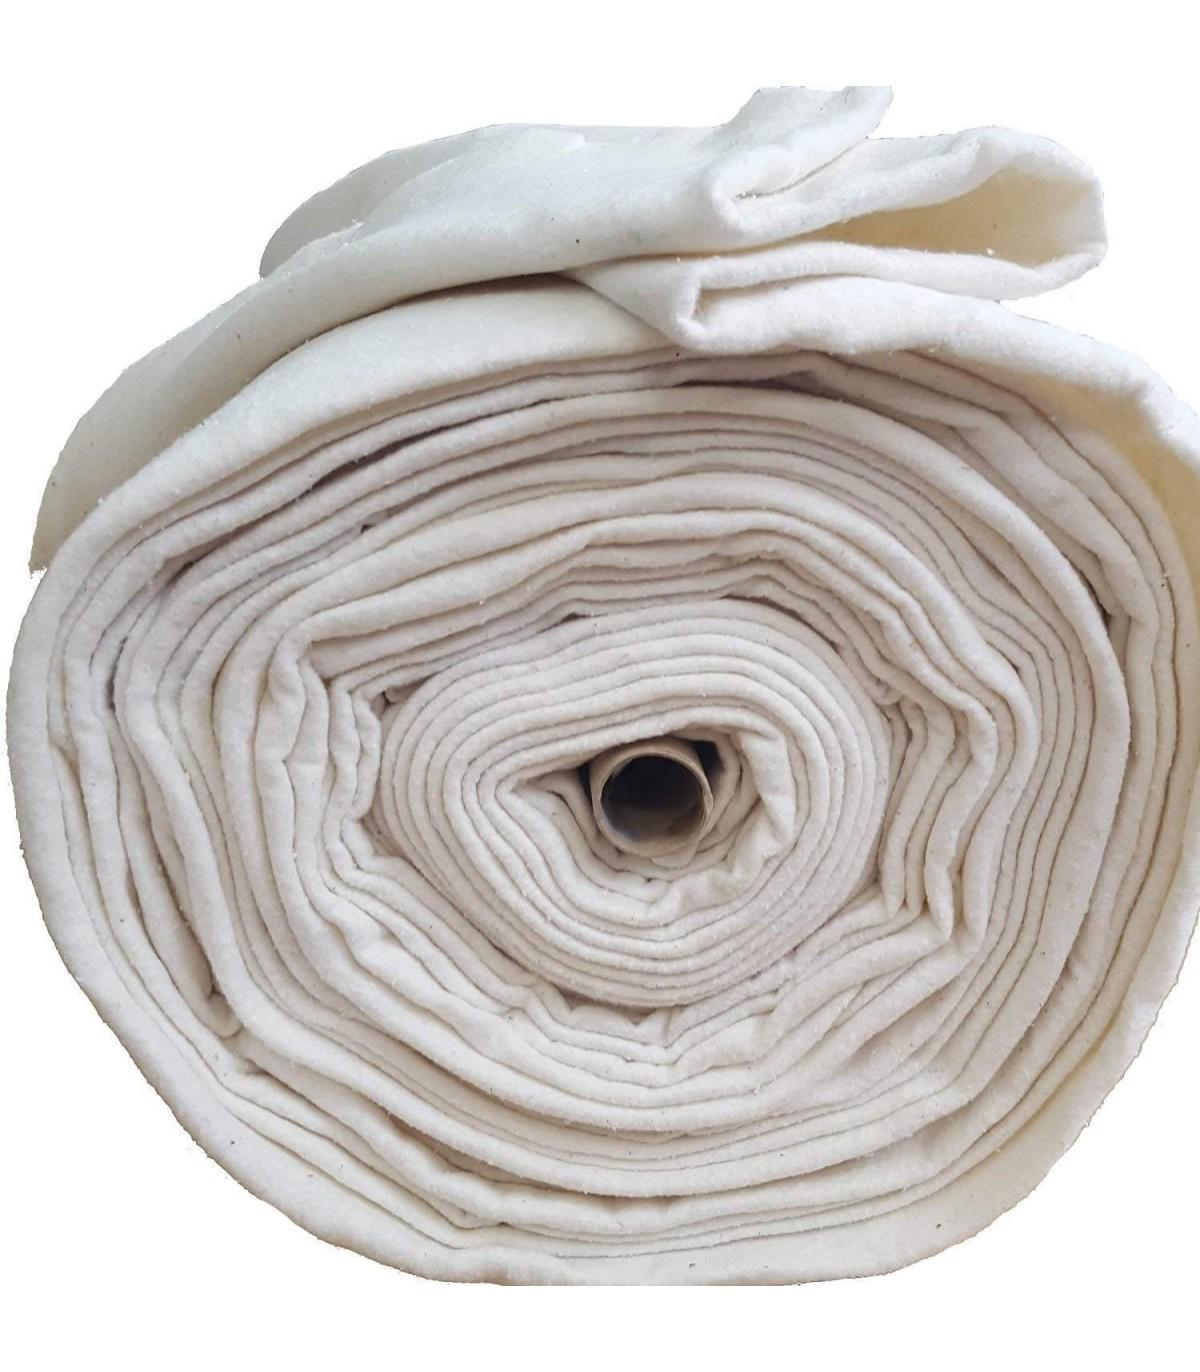 Guata - Napa de algodón para acolchar